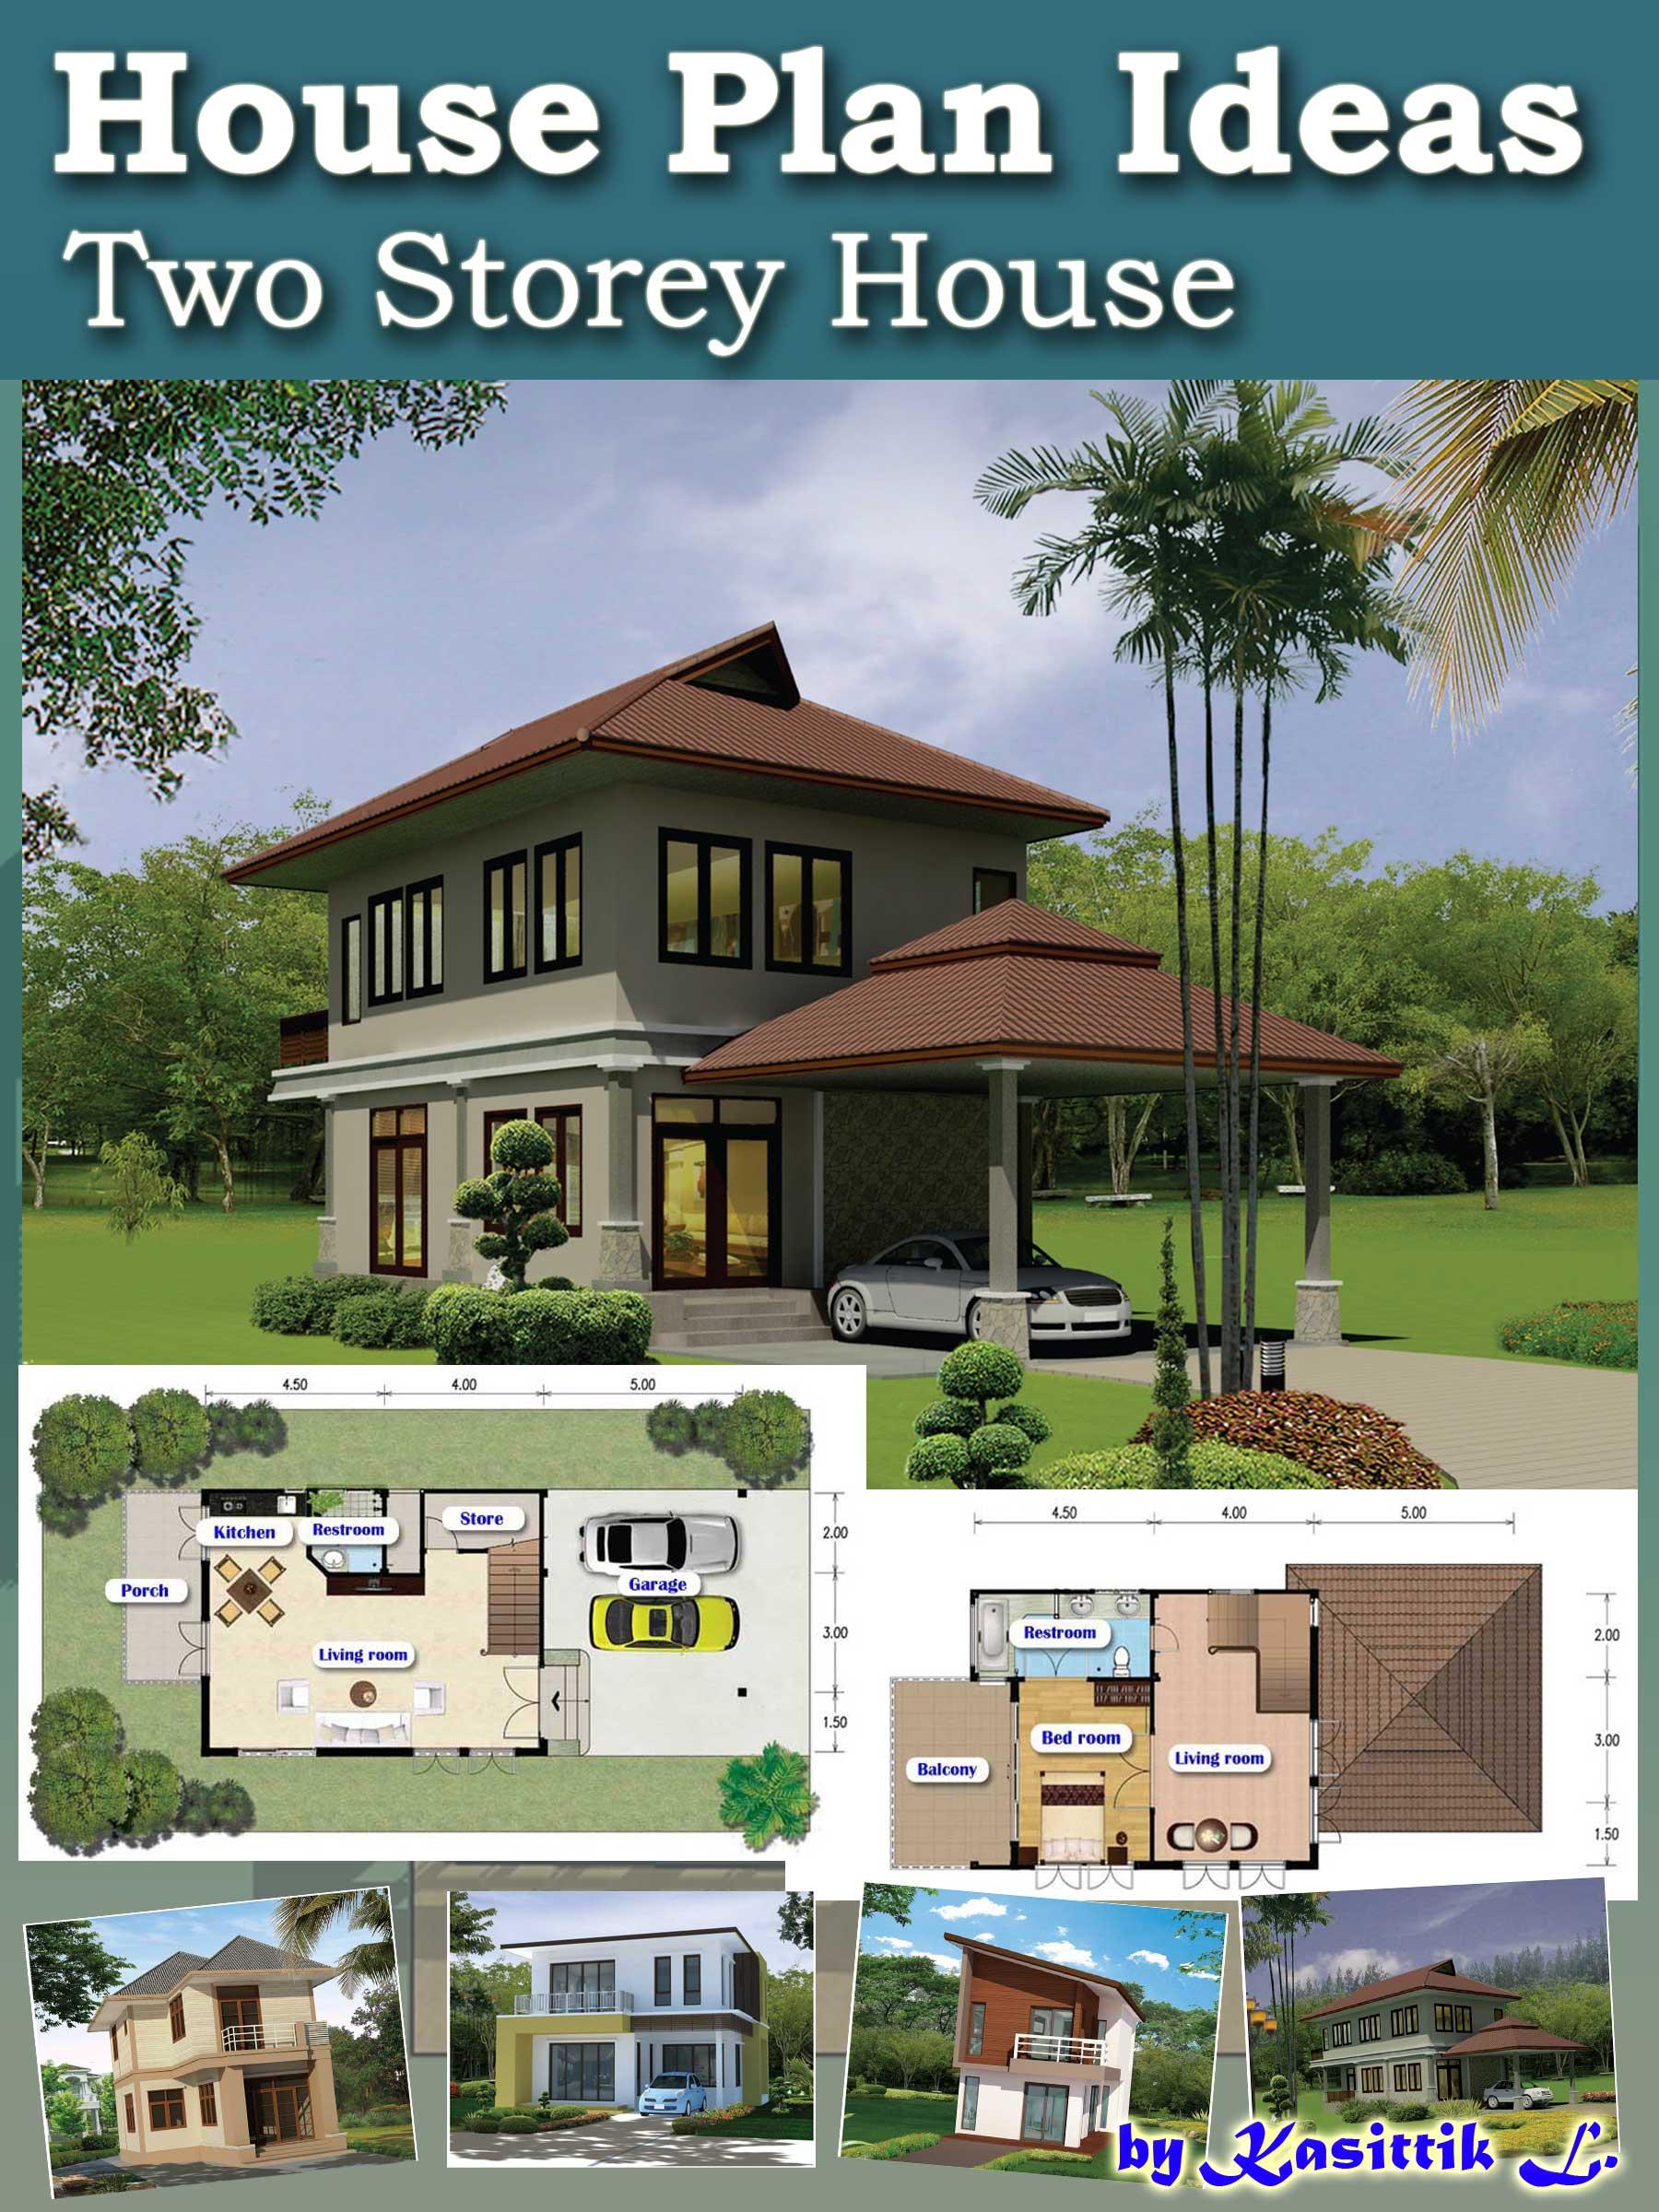 smashwords u2013 house plan ideas two storey house u2013 a book by